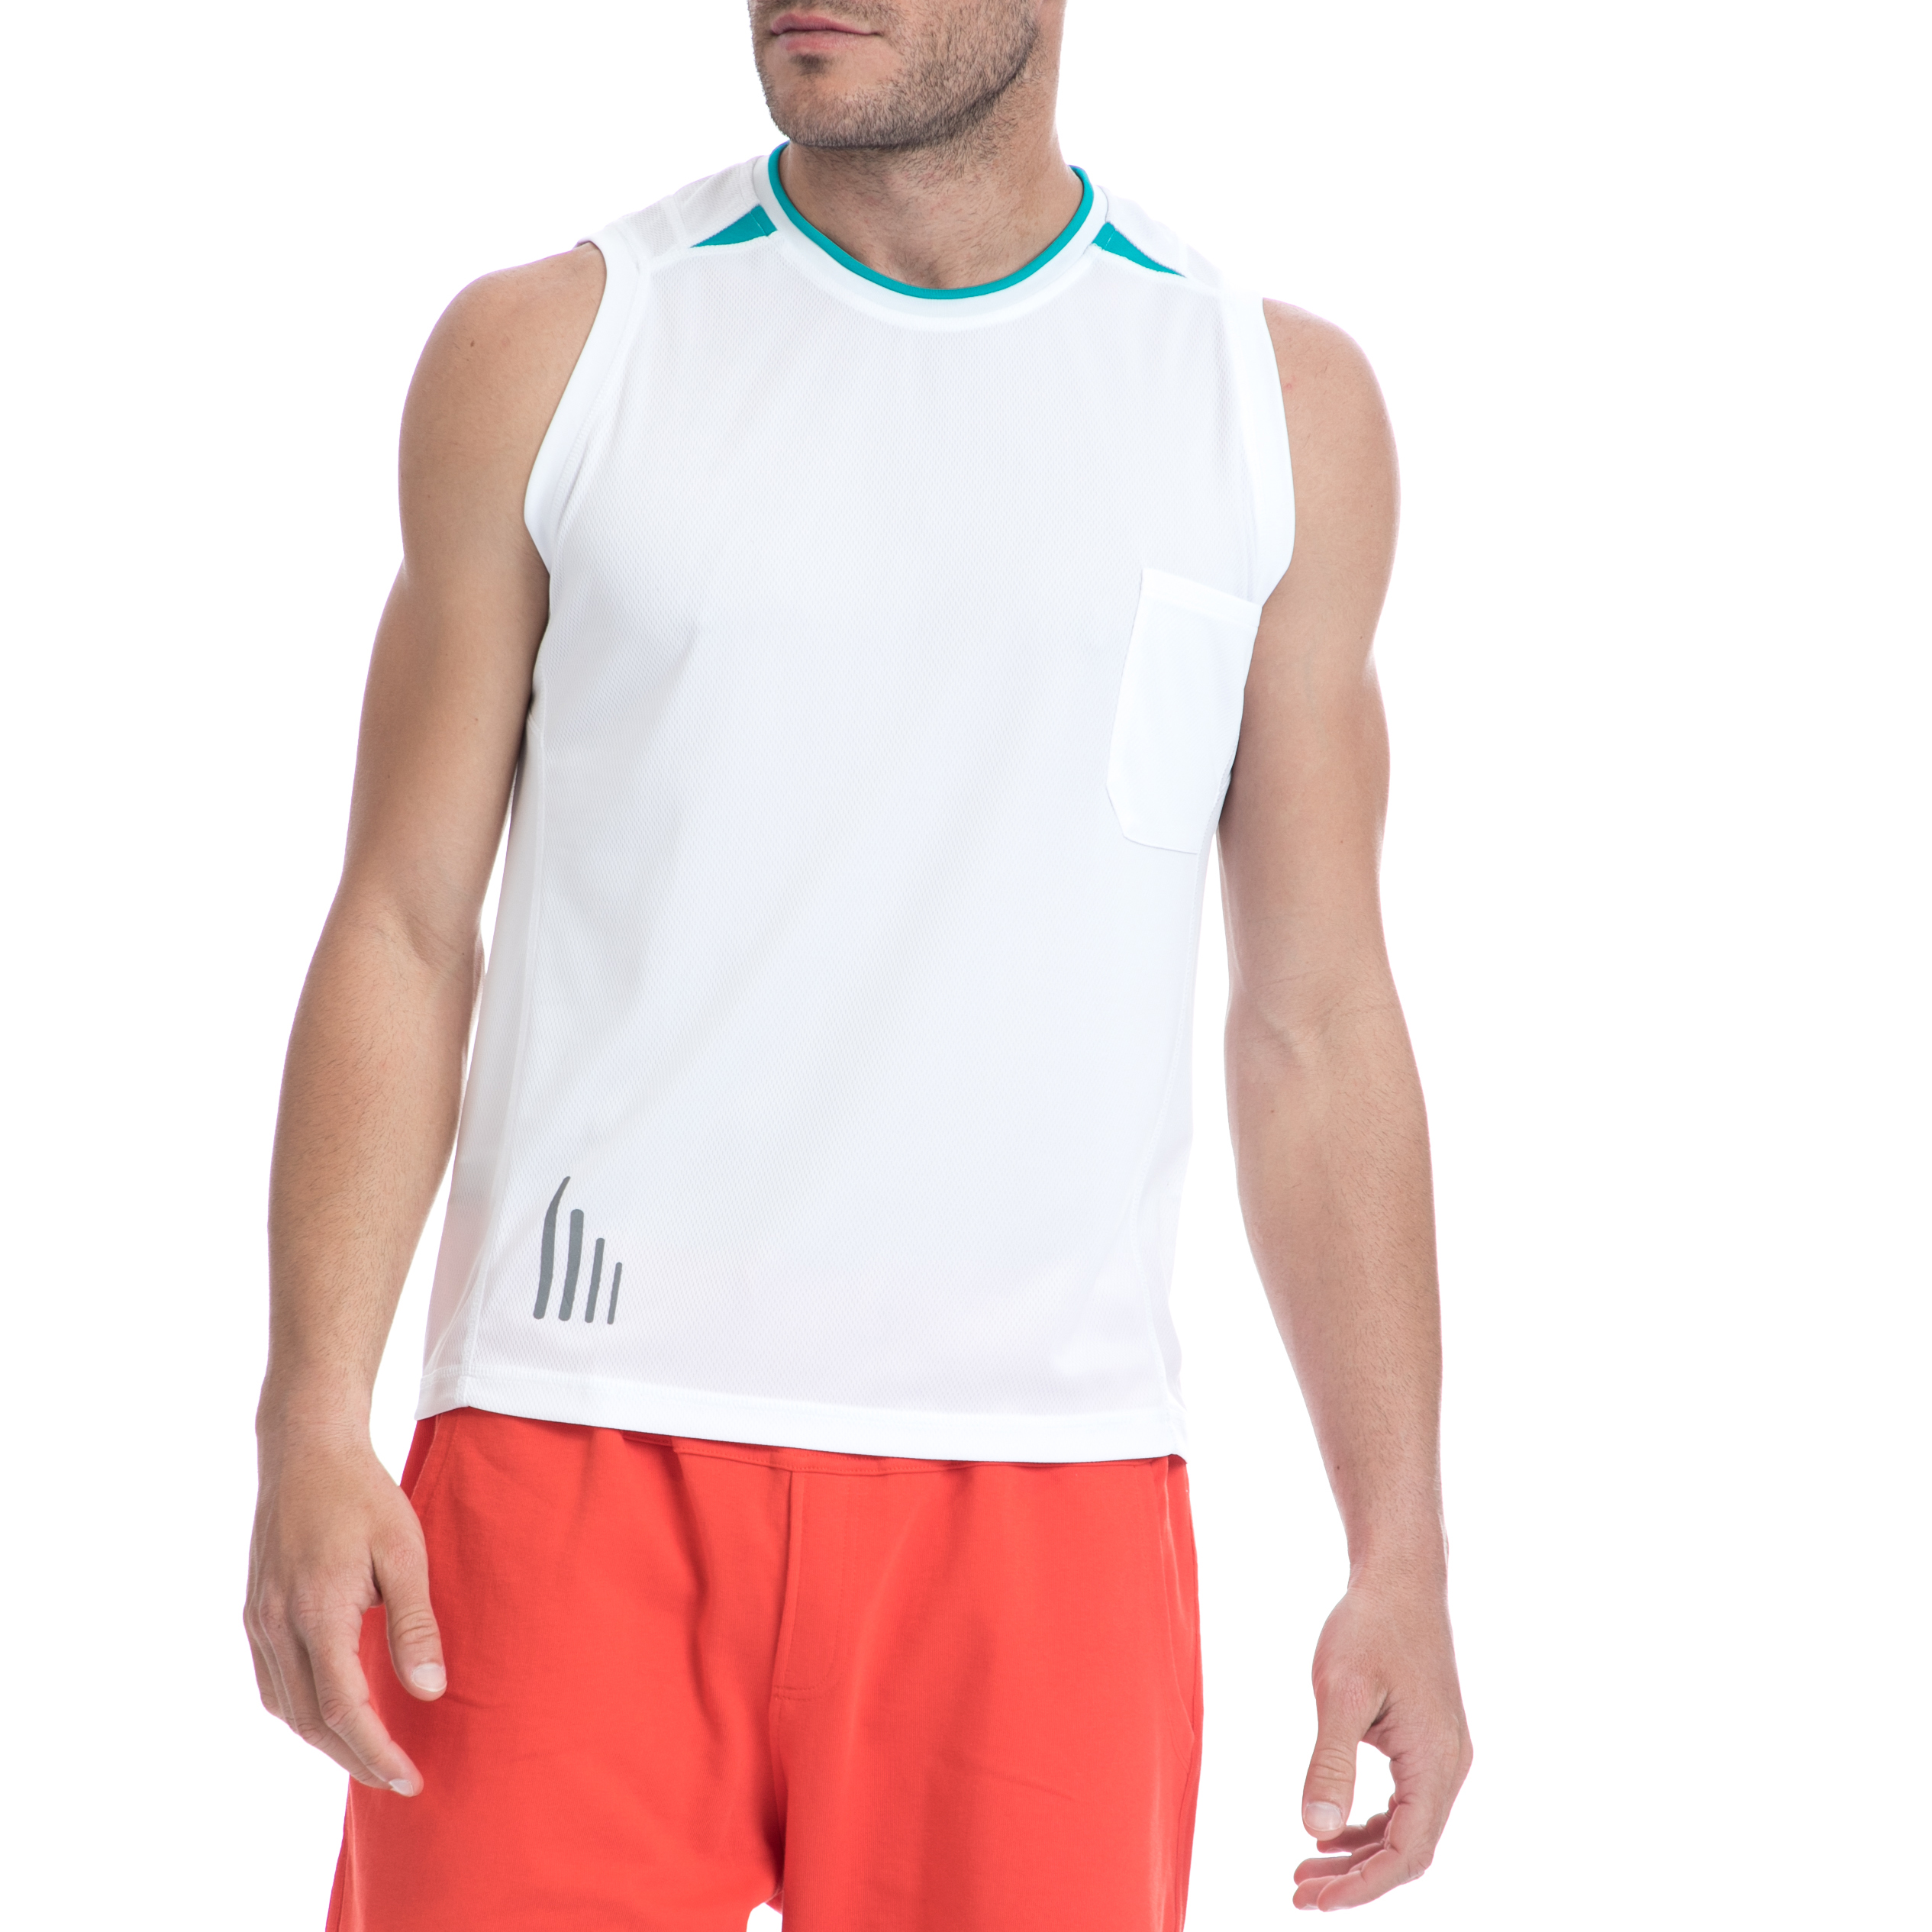 BODYTALK - Ανδρική αμάνικη μπλούζα BODYTALK λευκή ανδρικά ρούχα αθλητικά t shirt